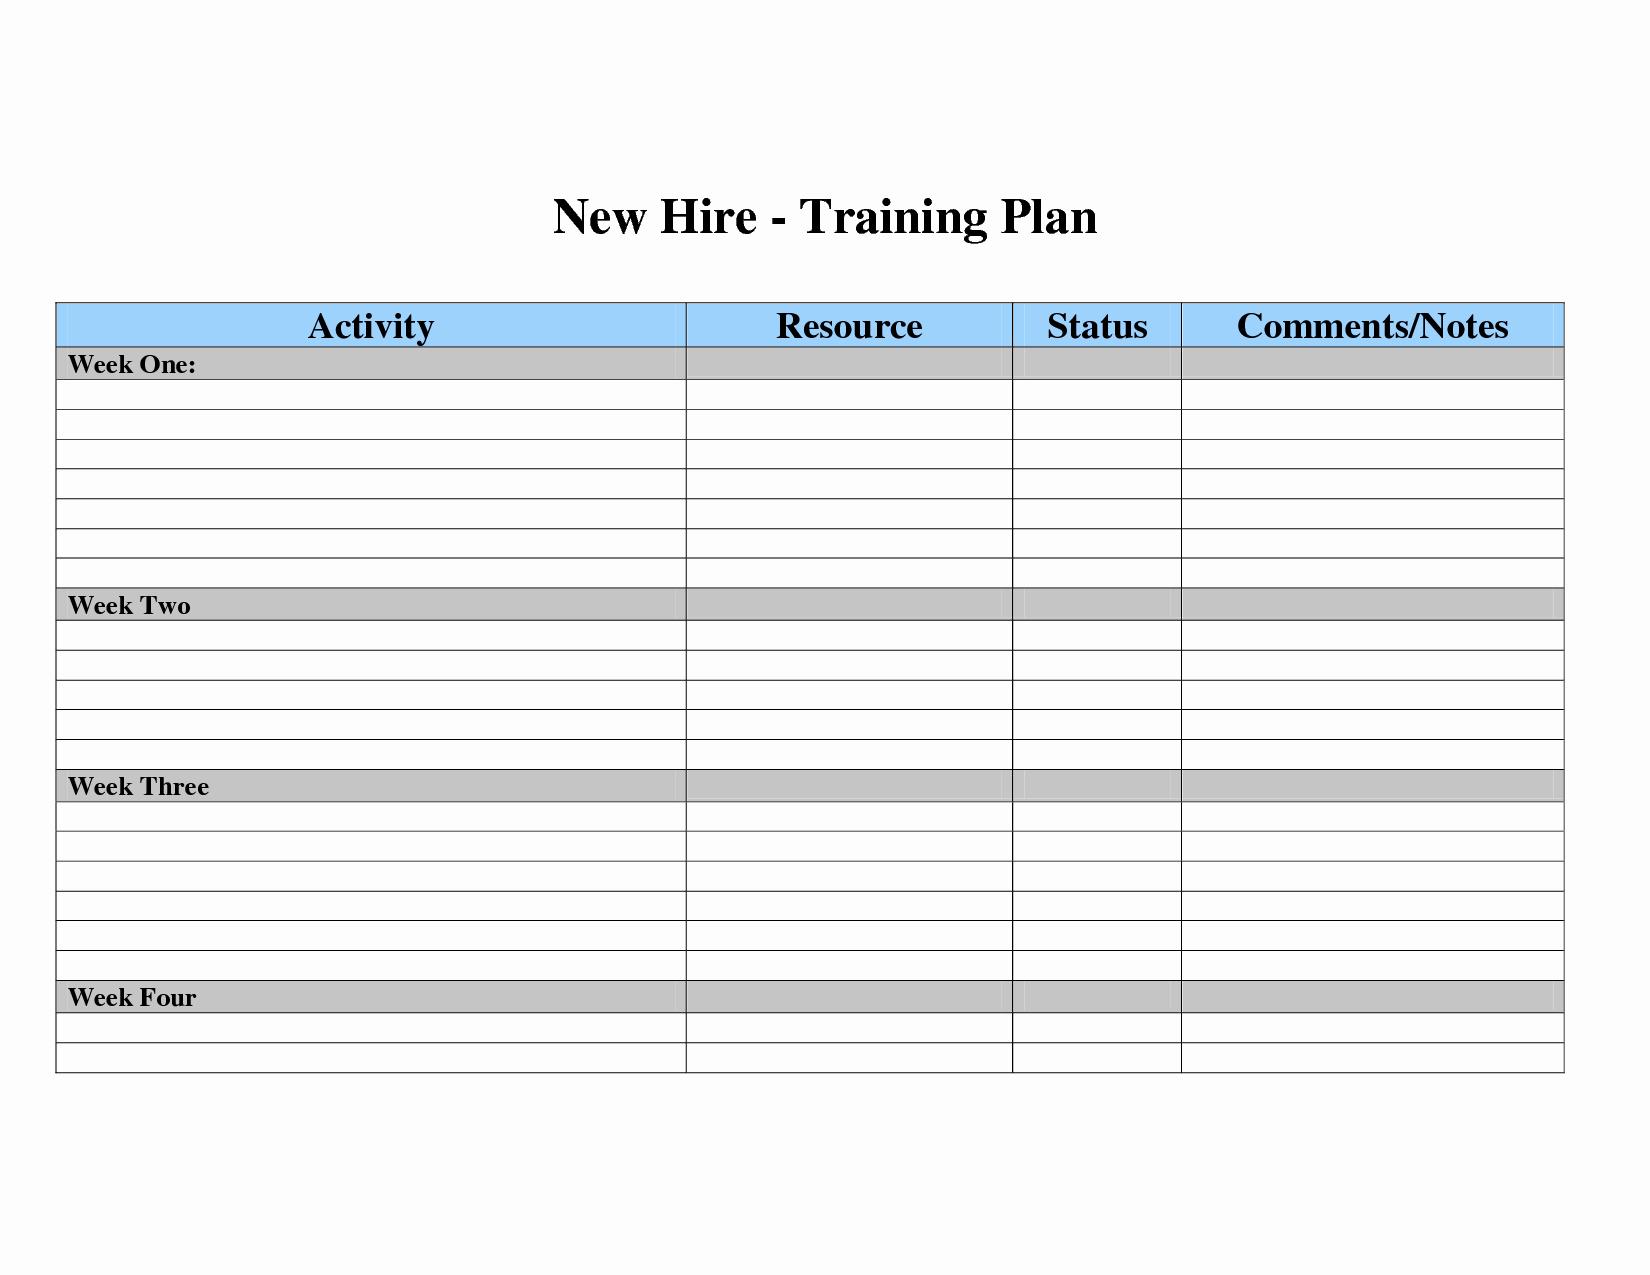 Employee Training Plan Template Excel Fresh Employee Training Plan Template